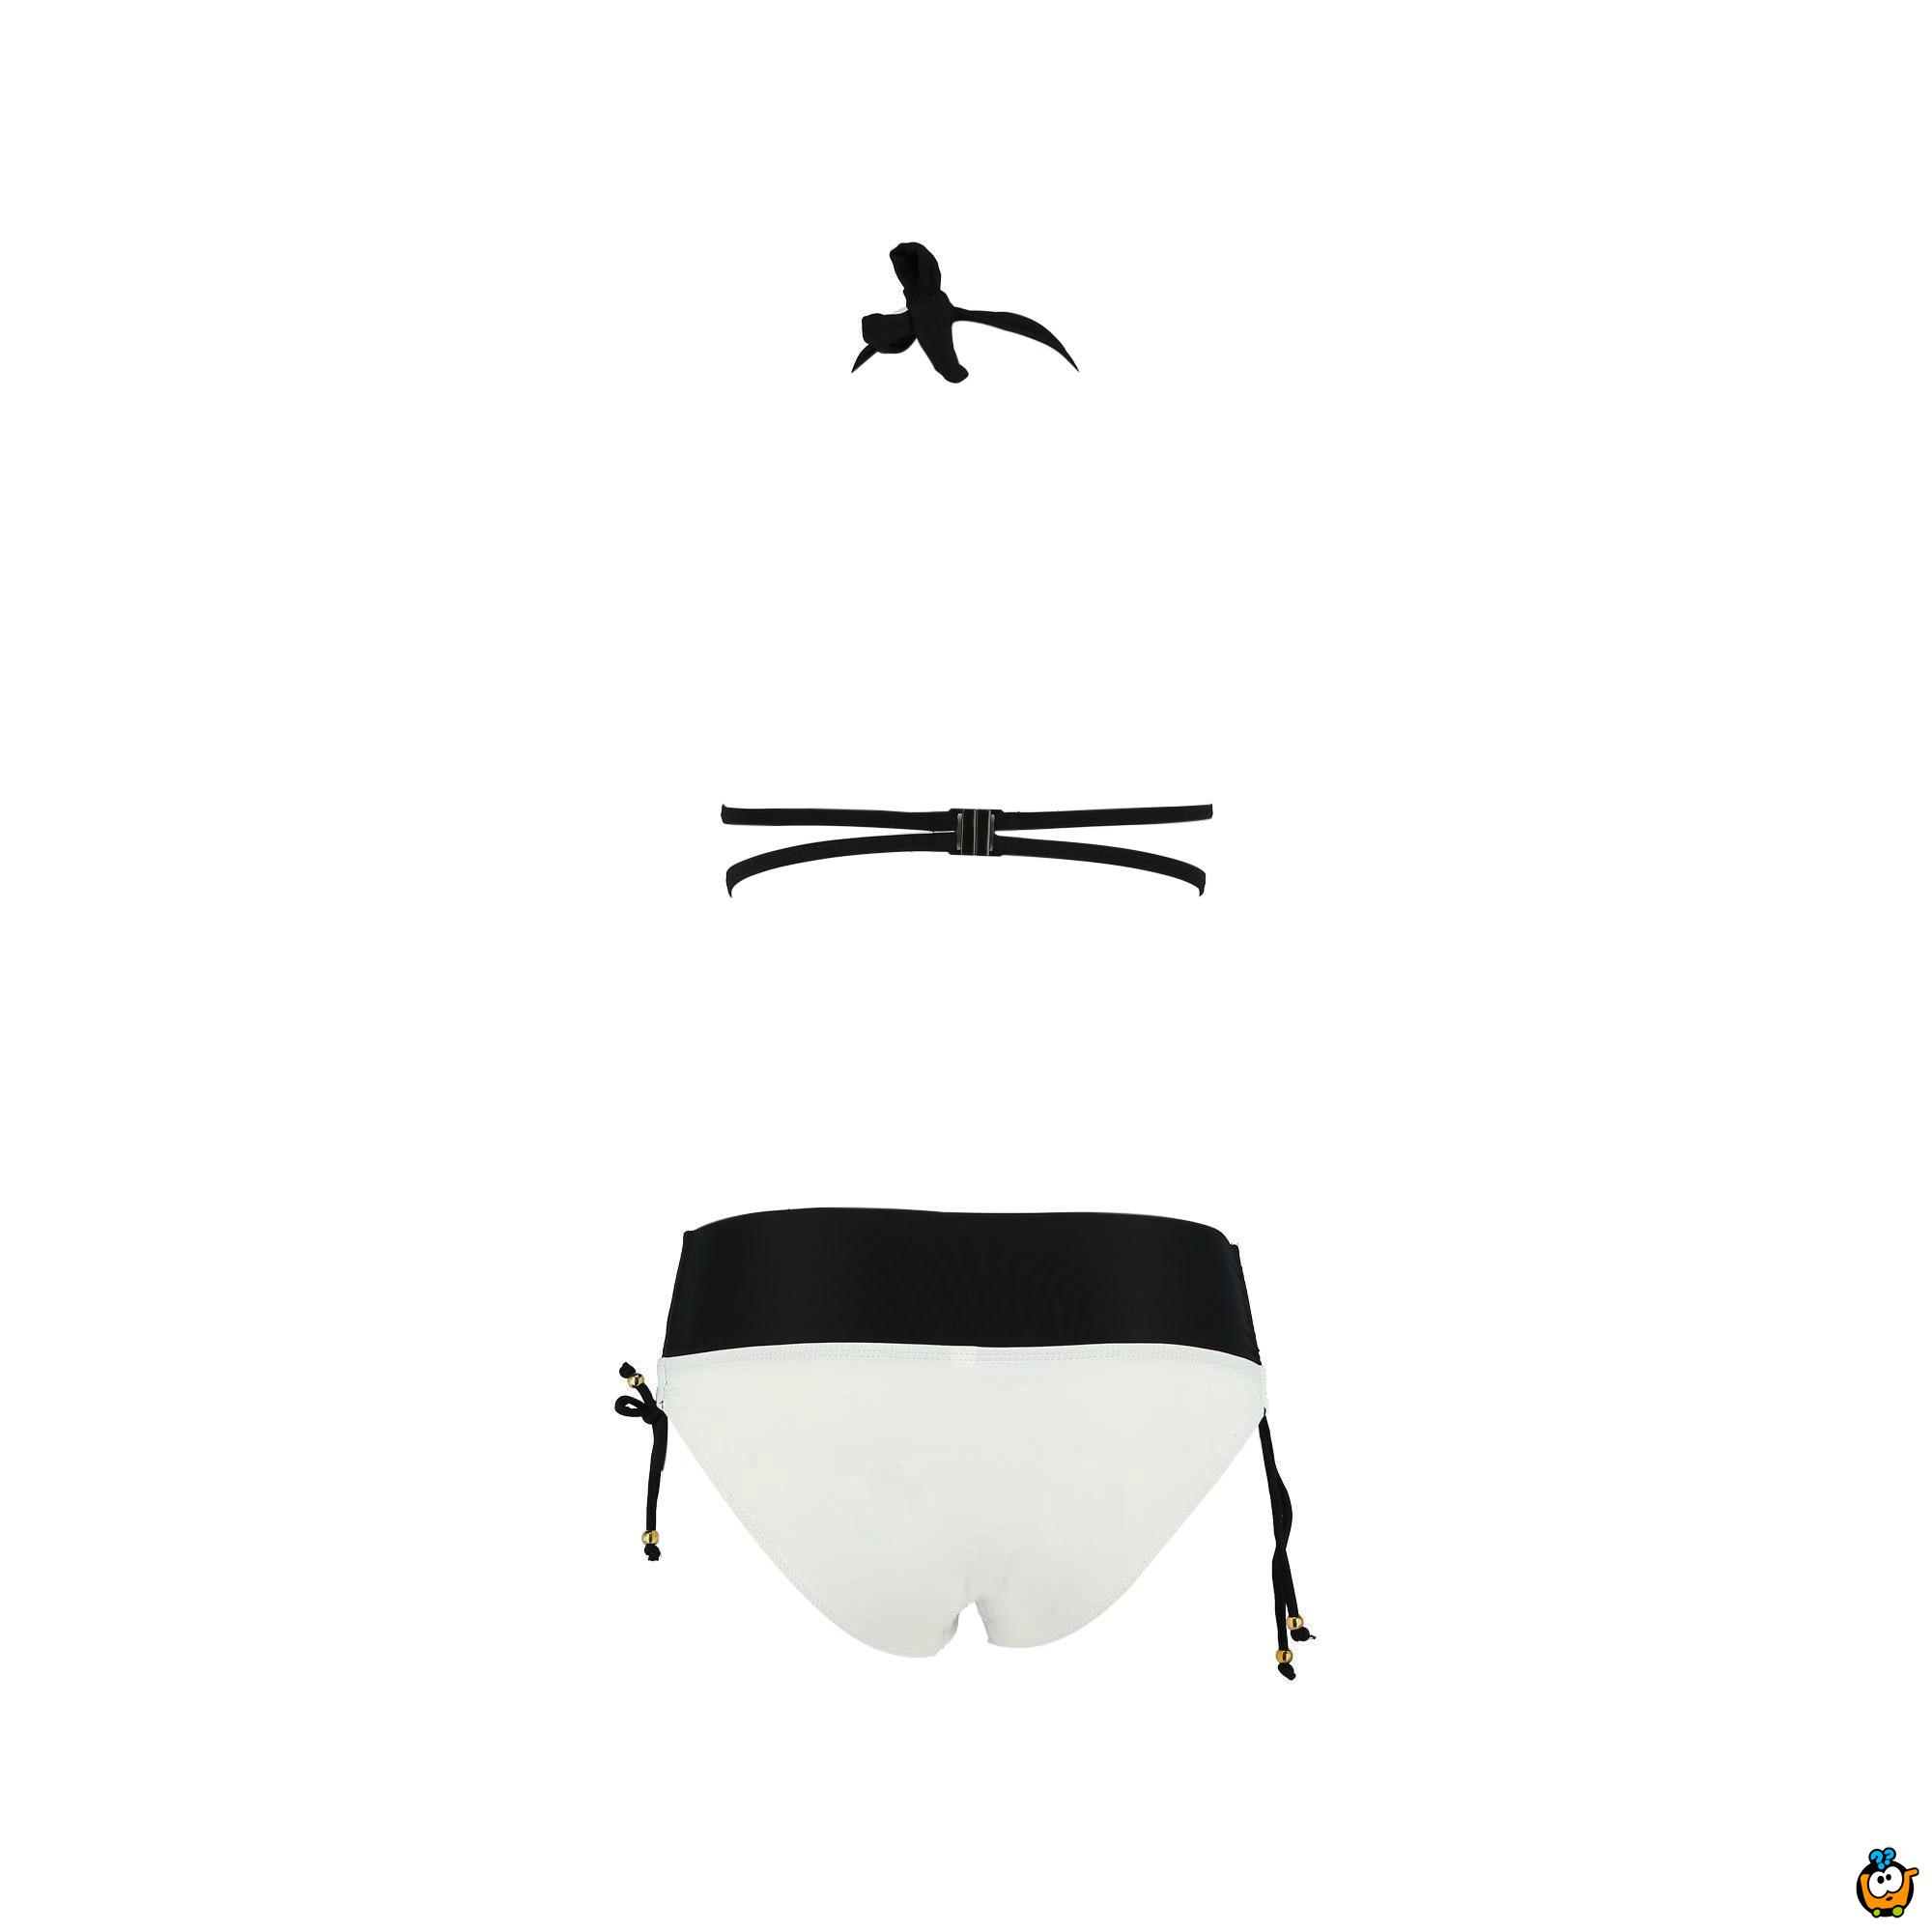 Dvodelni ženski kupaći kostim - MIAMI B